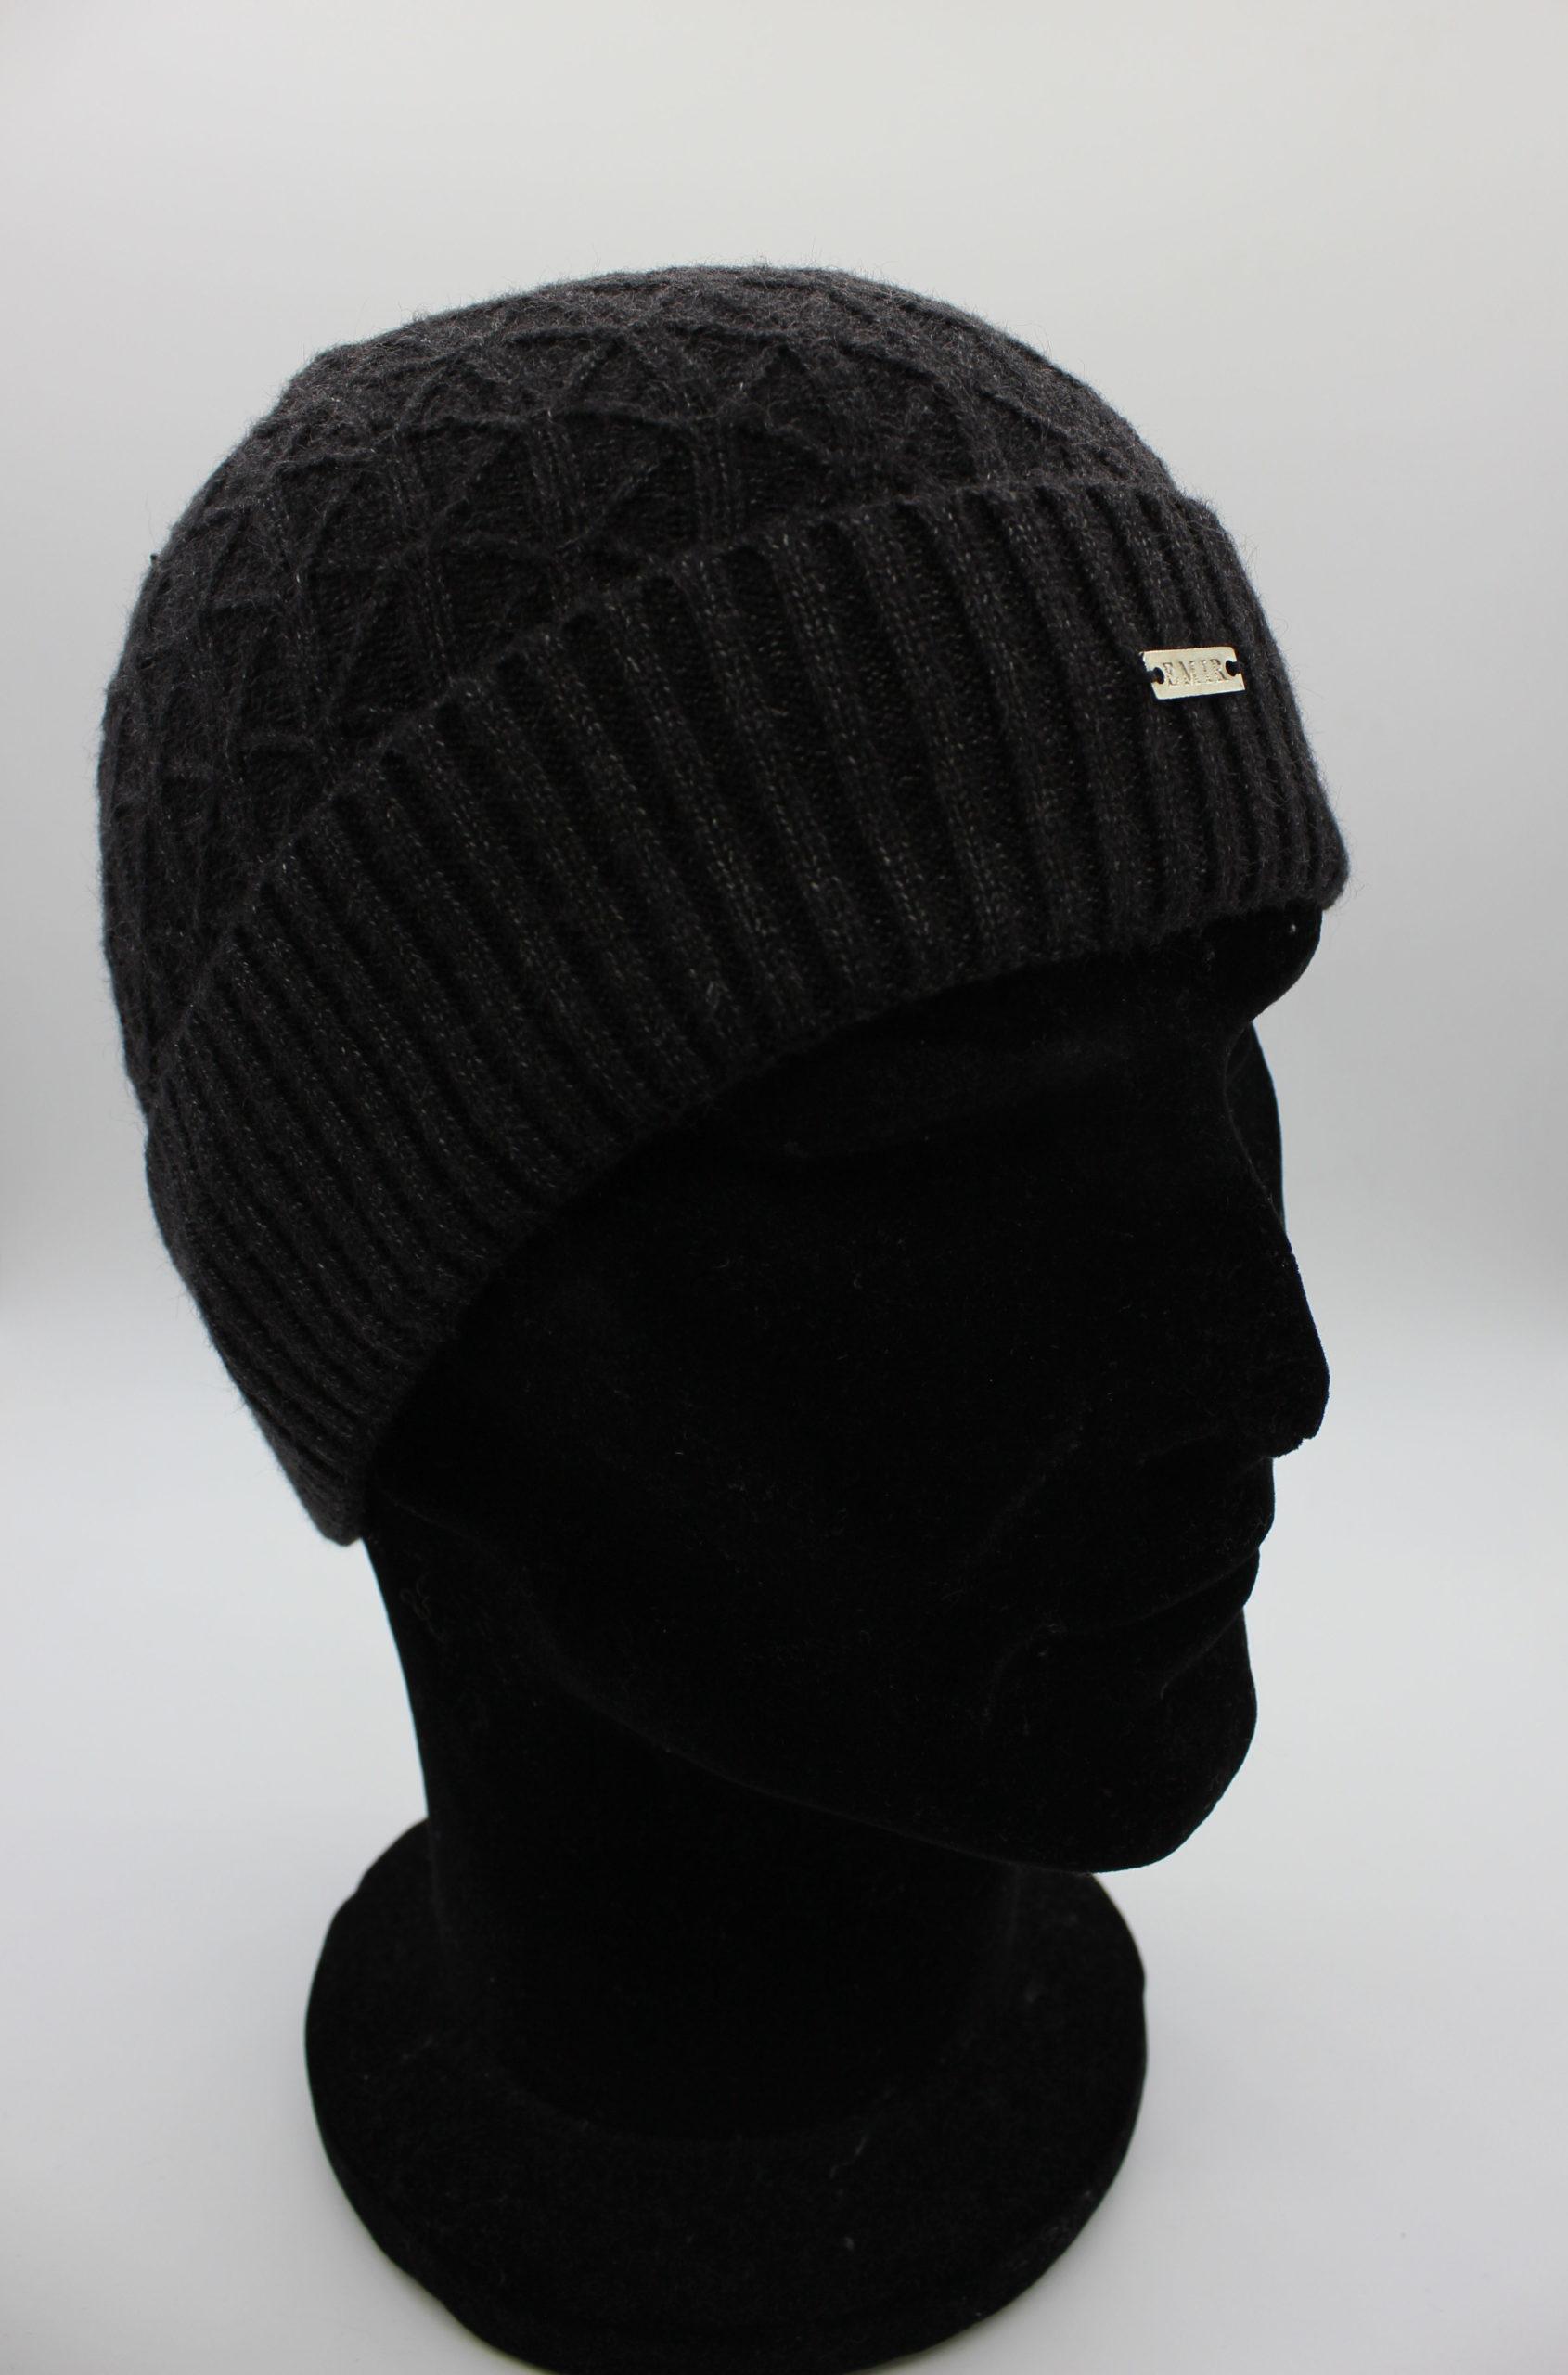 Bonnet EMIR modest fashion